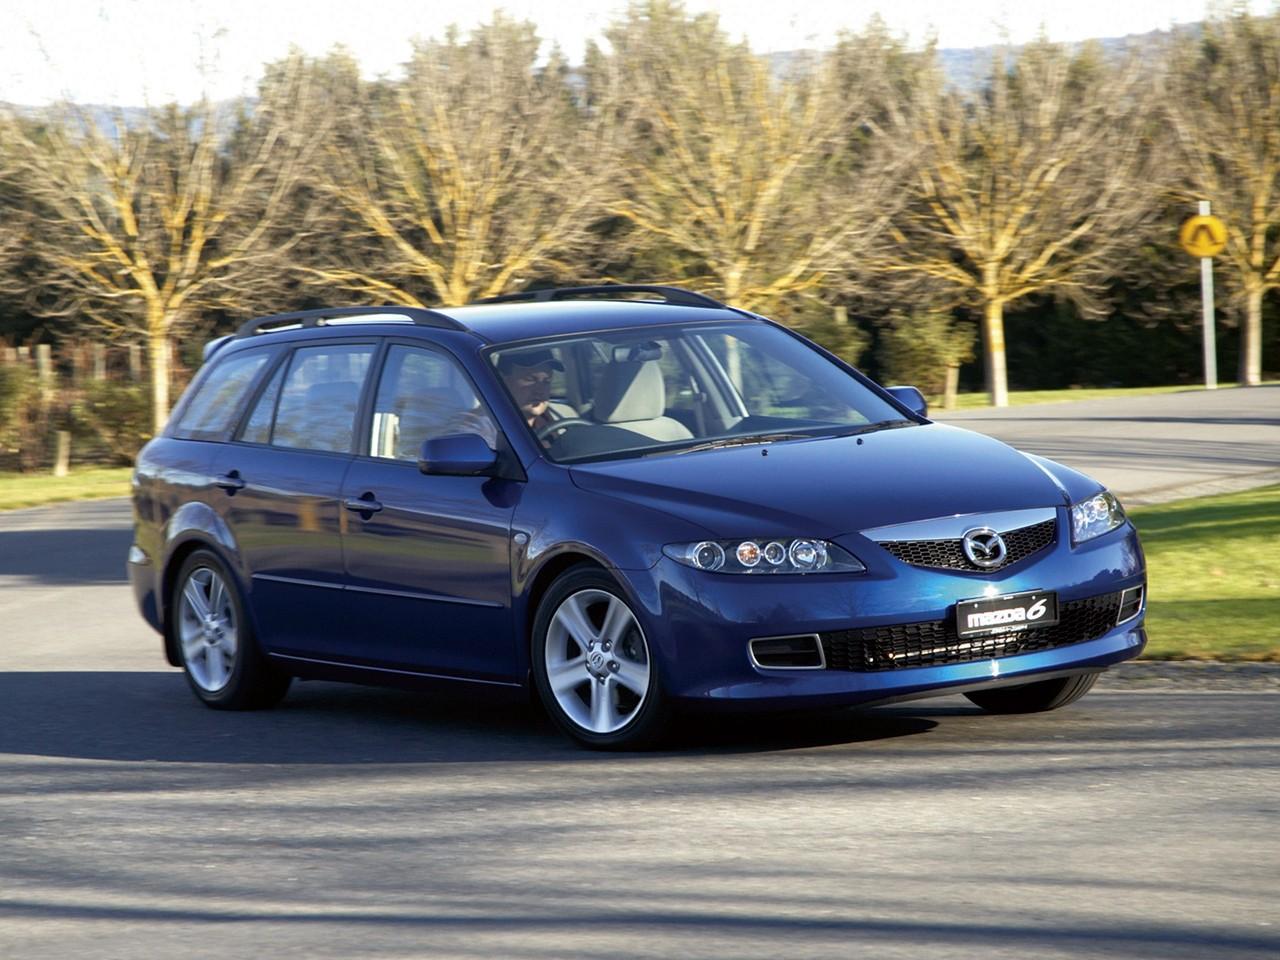 2005 Mazda Atenza Sport Wagon (50 Images) - HD Car Wallpaper